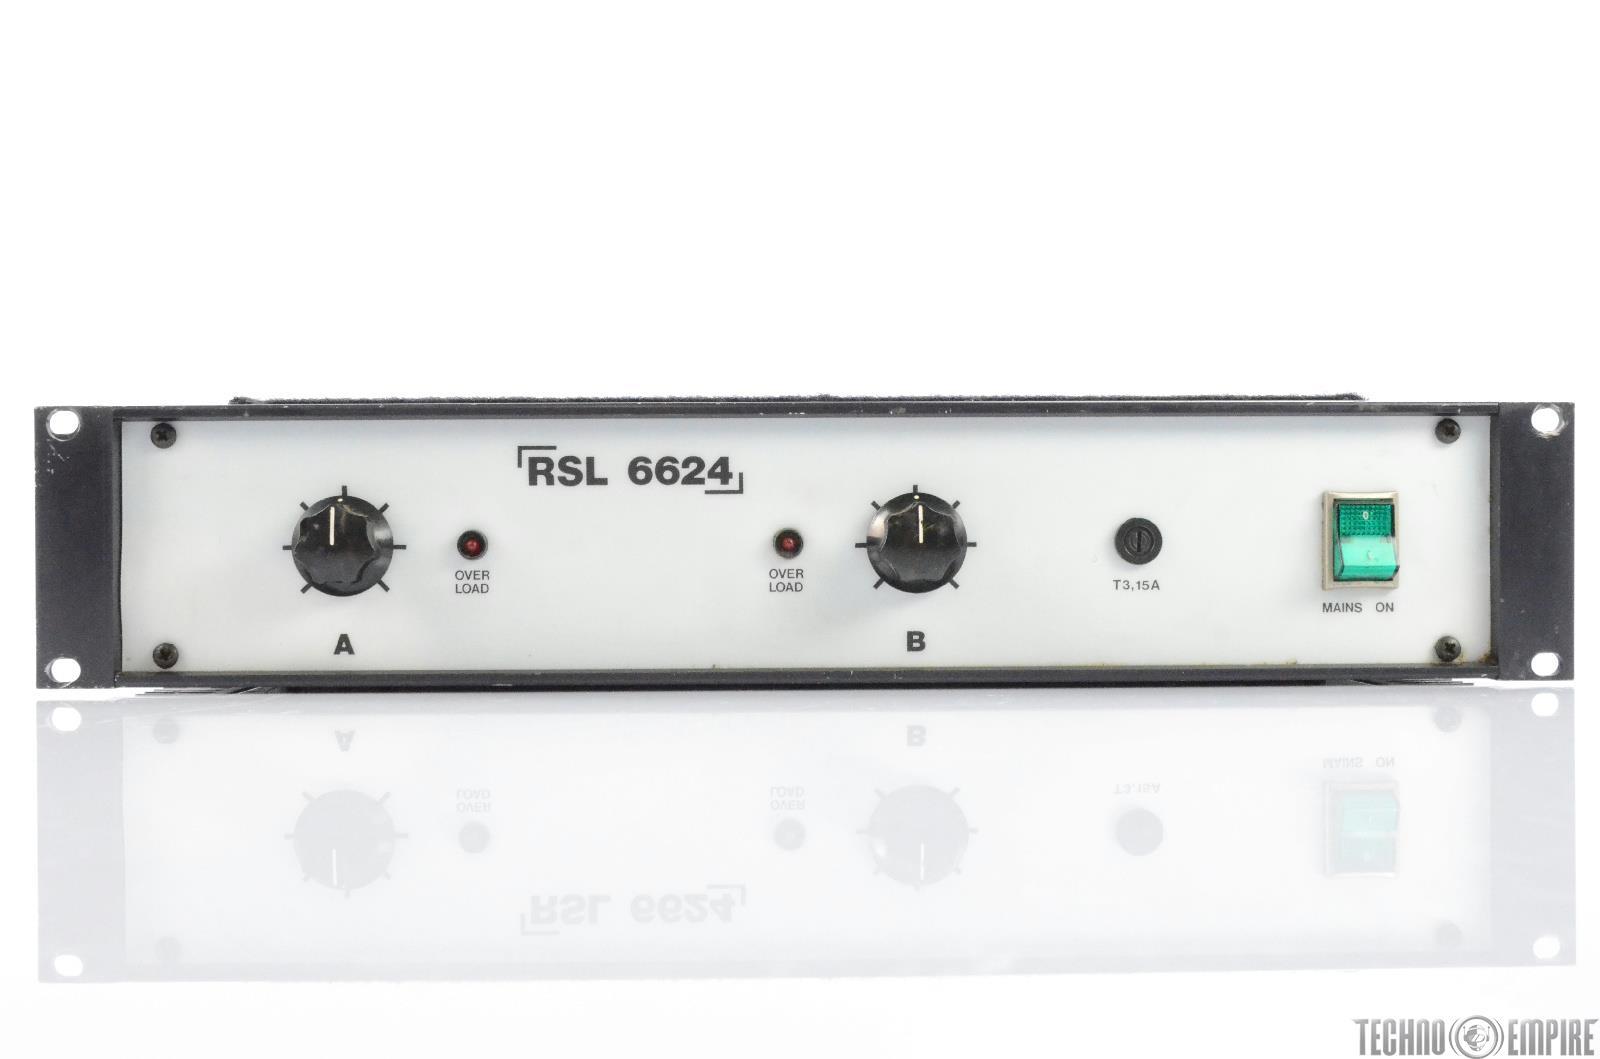 RSL Music 6624 Stereo Amplifier Power Amp Made in Sweden #29854